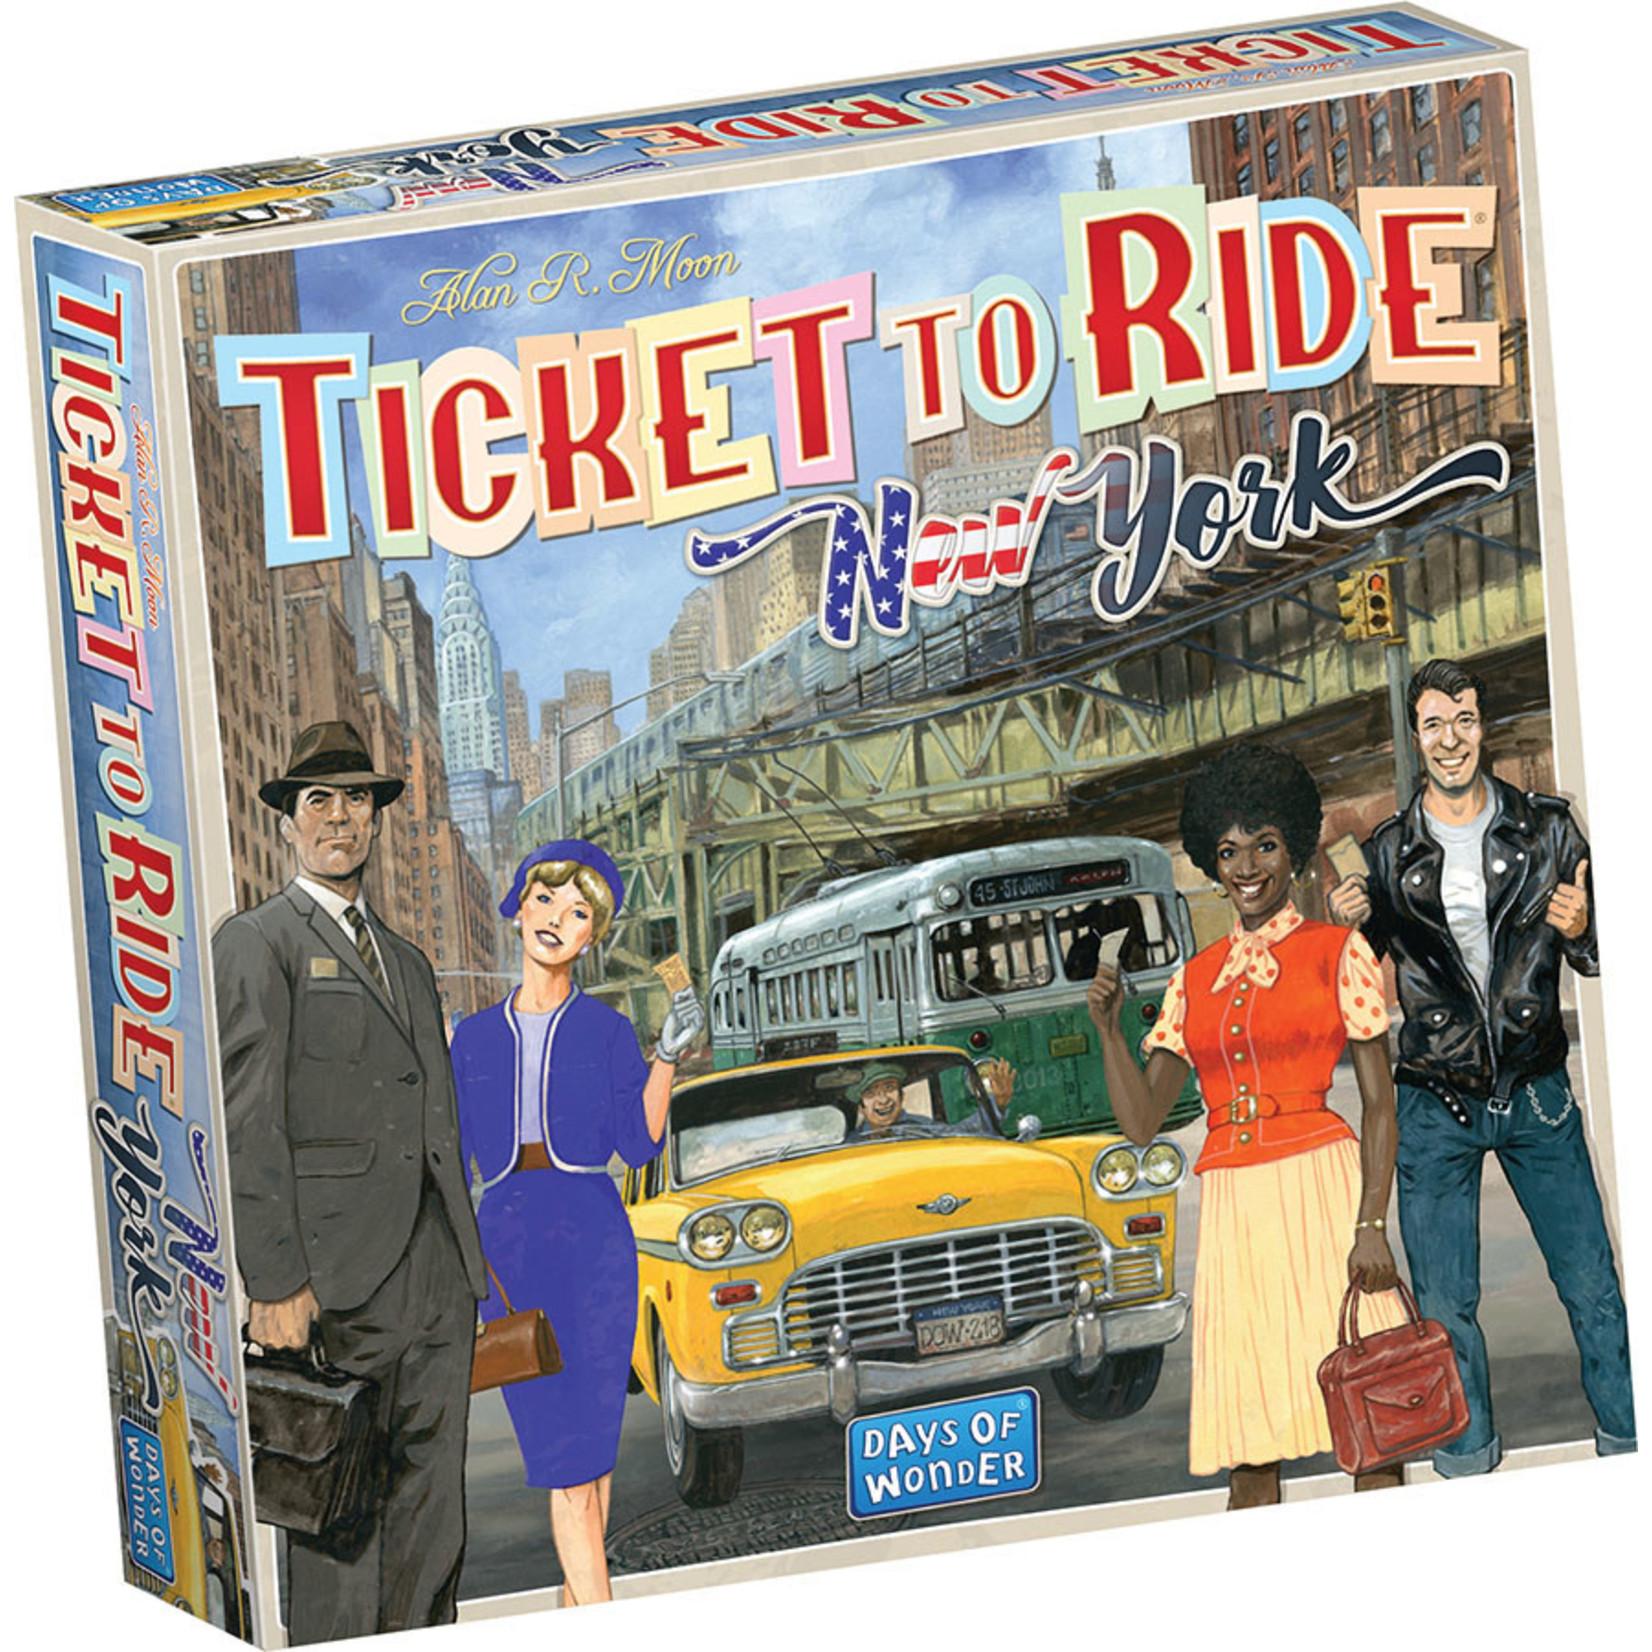 Days of Wonder Ticket to Ride Express New York